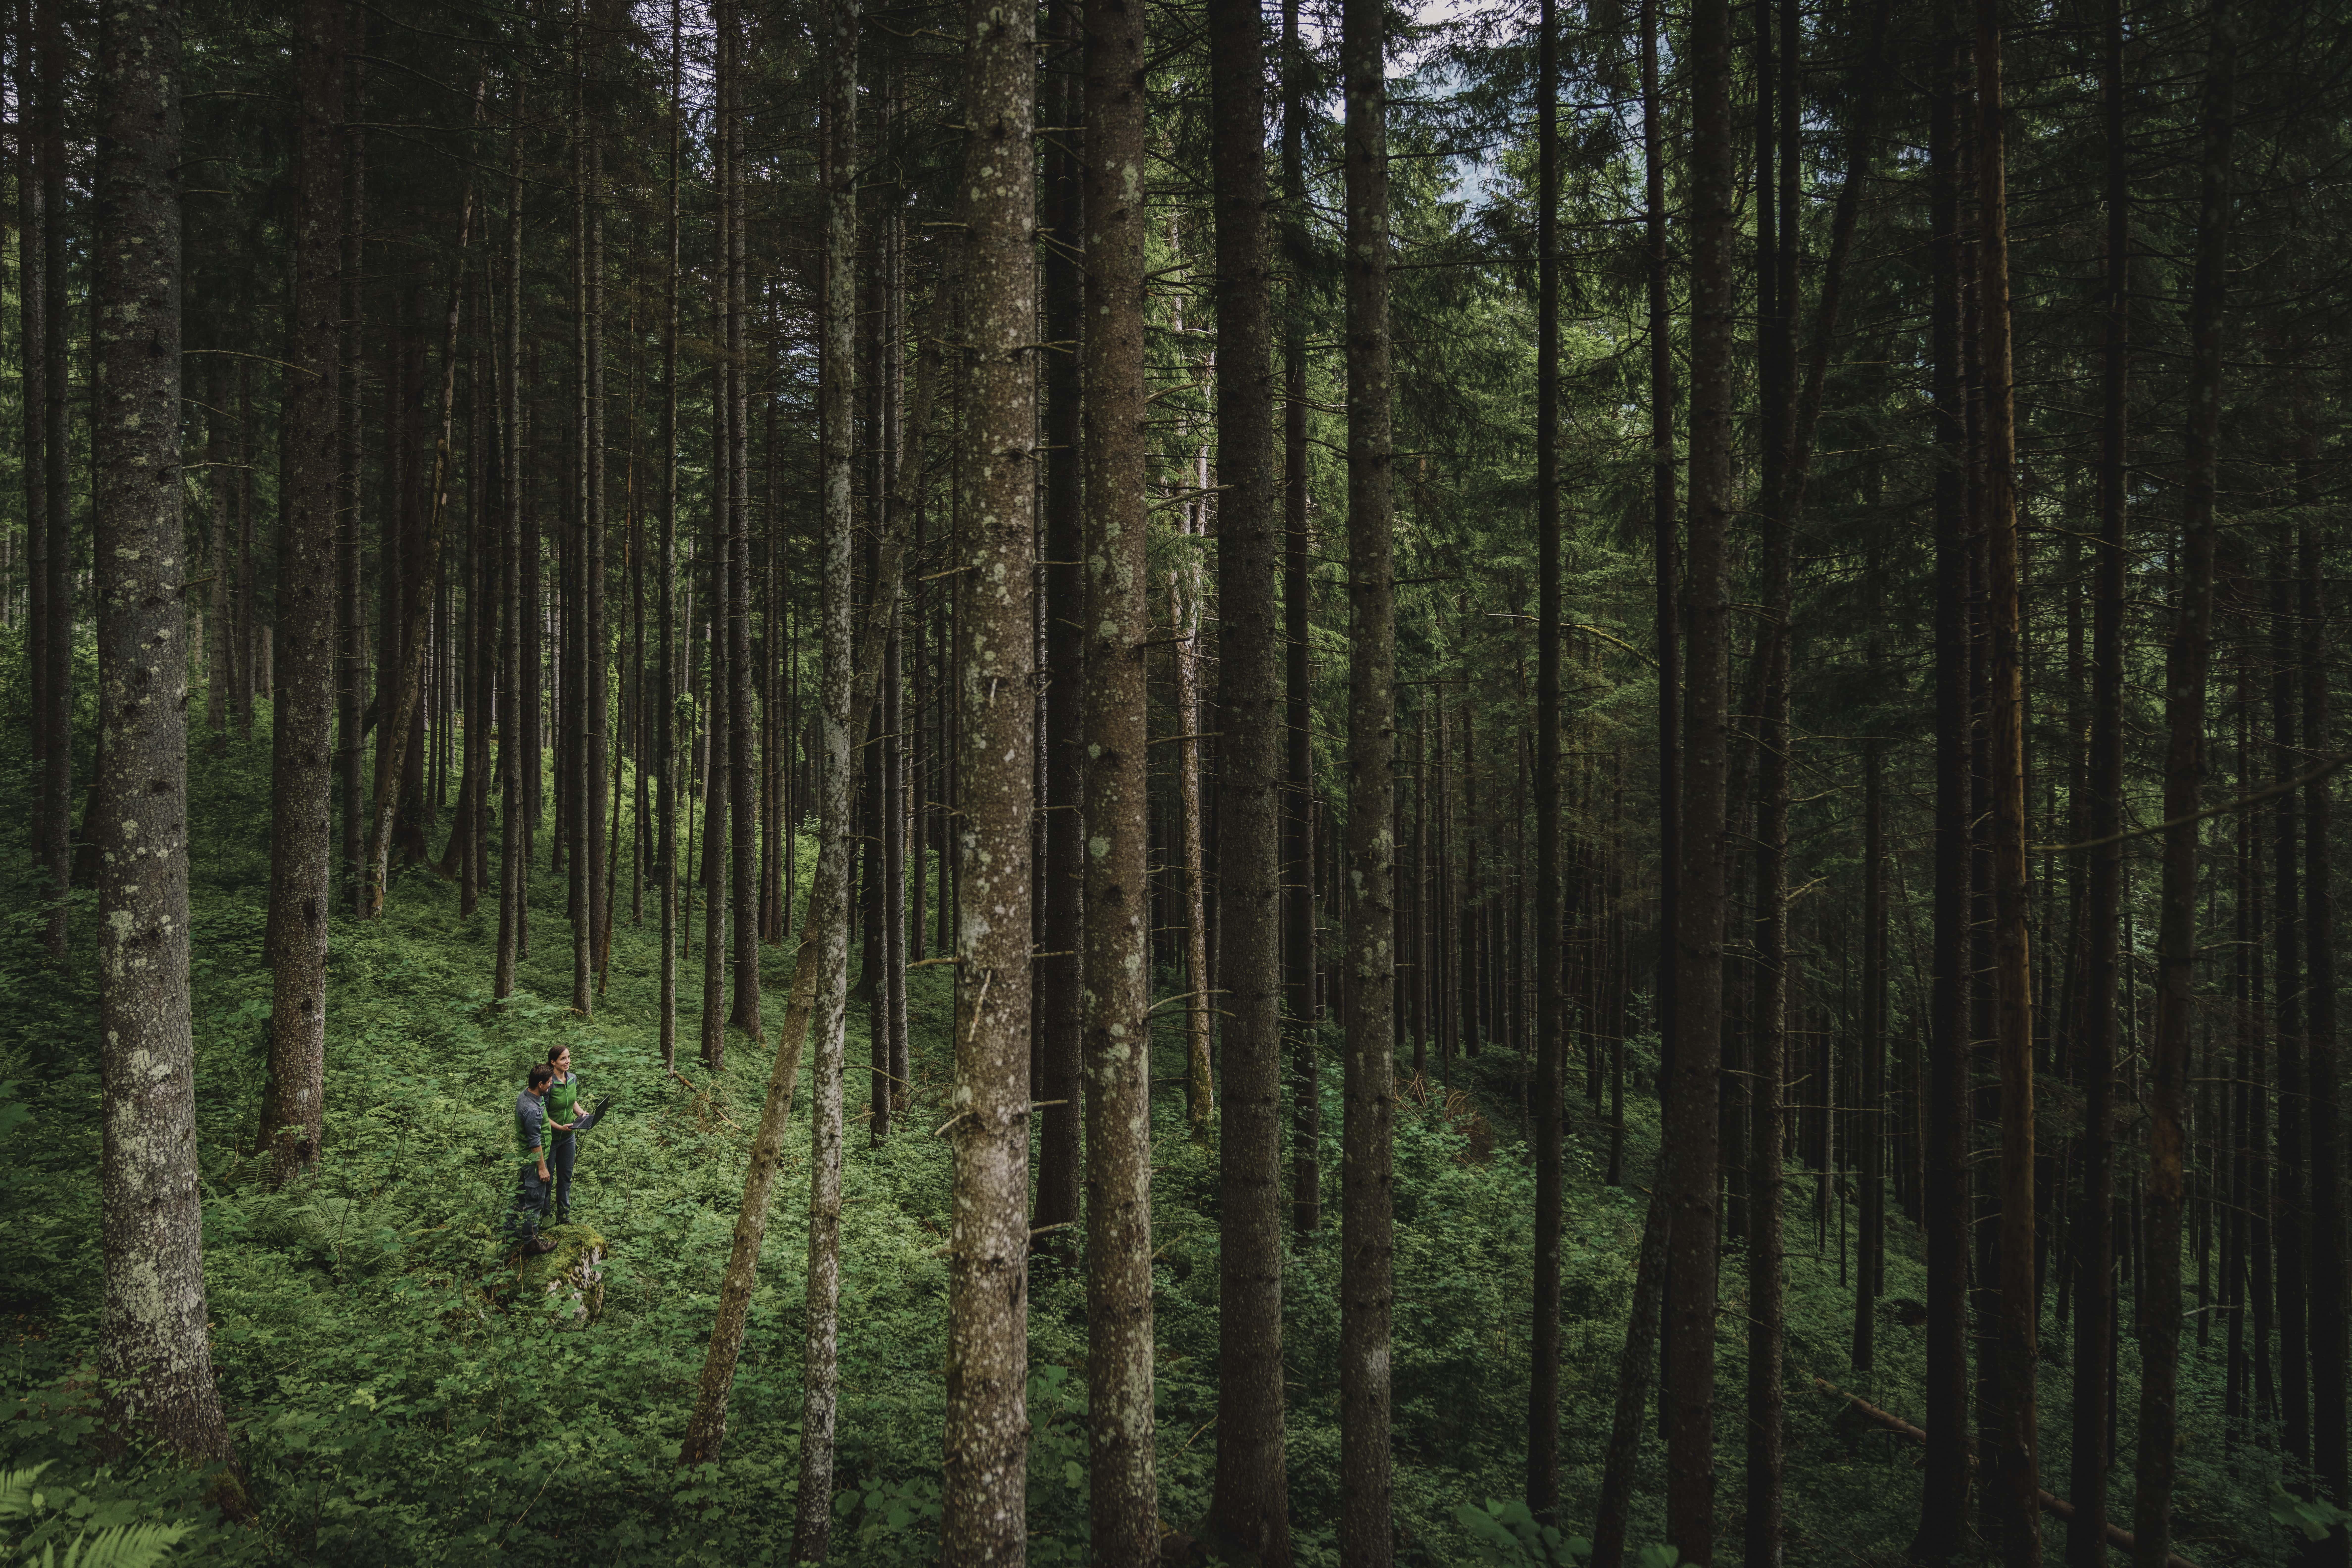 036_Nationalpark_Gesäuse_Naturschutz_Ranger©StefanLeitner_NPG-min